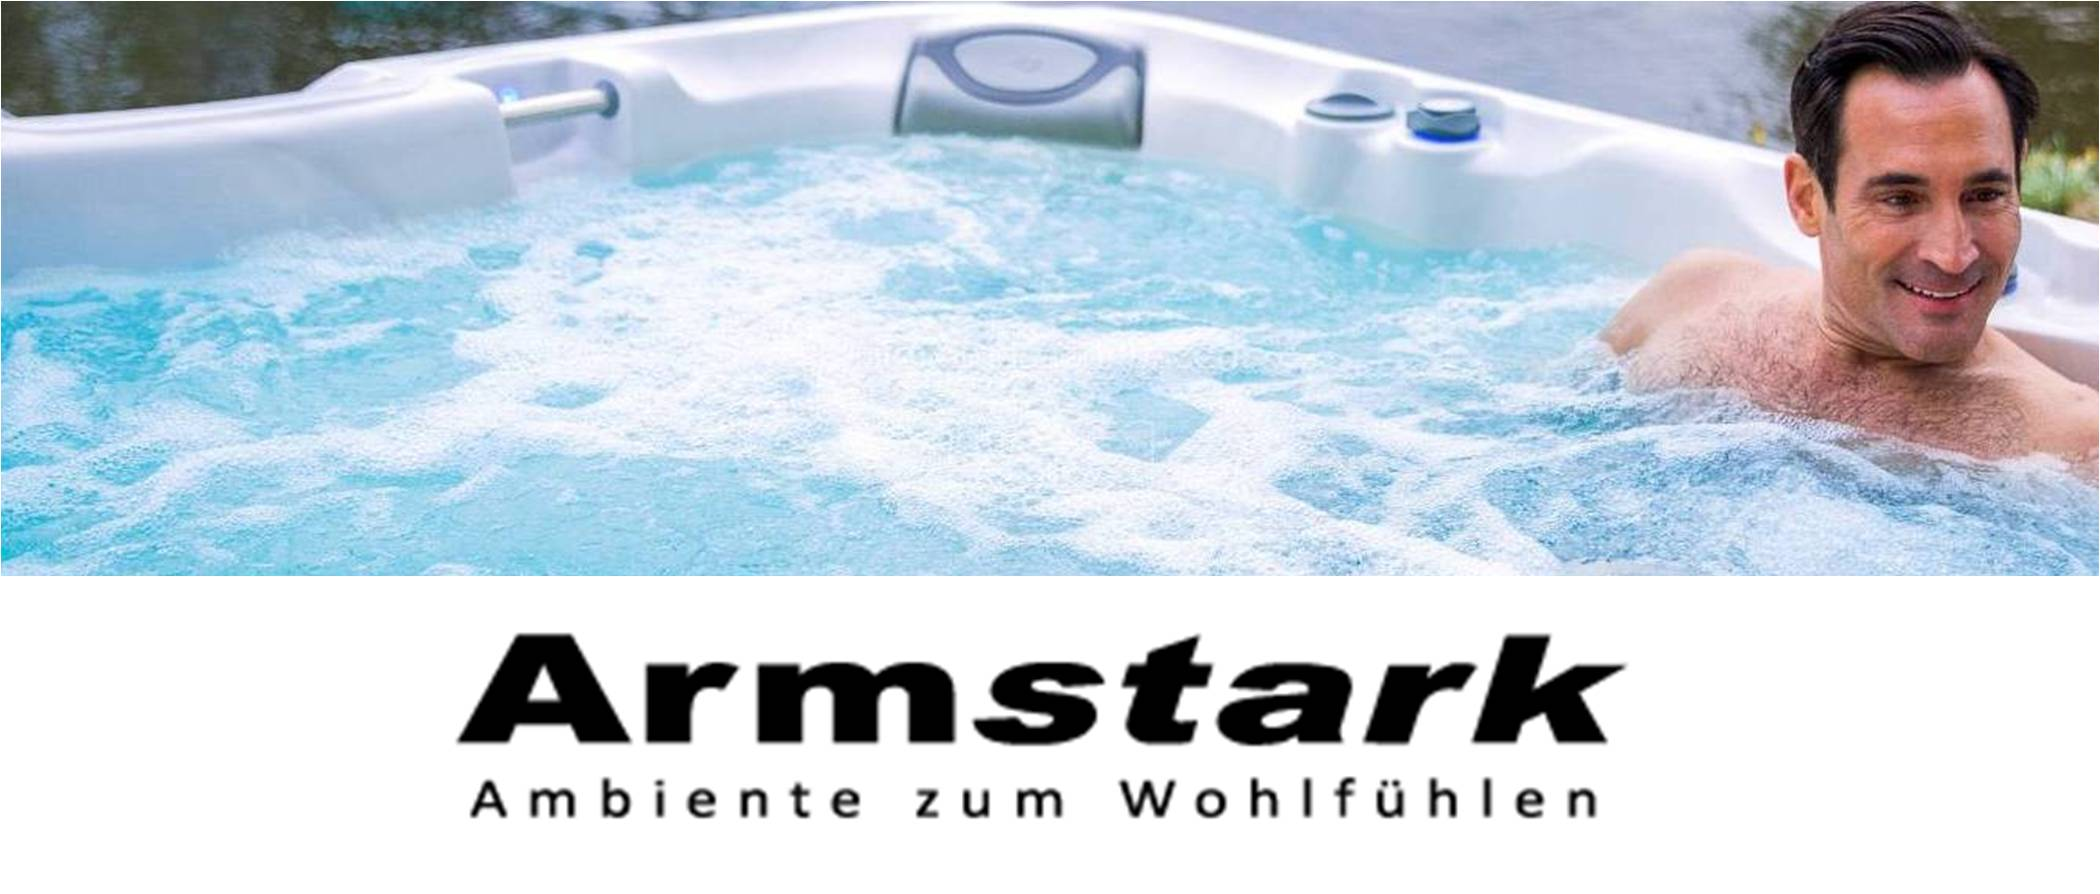 ARMSTARK WEB 2